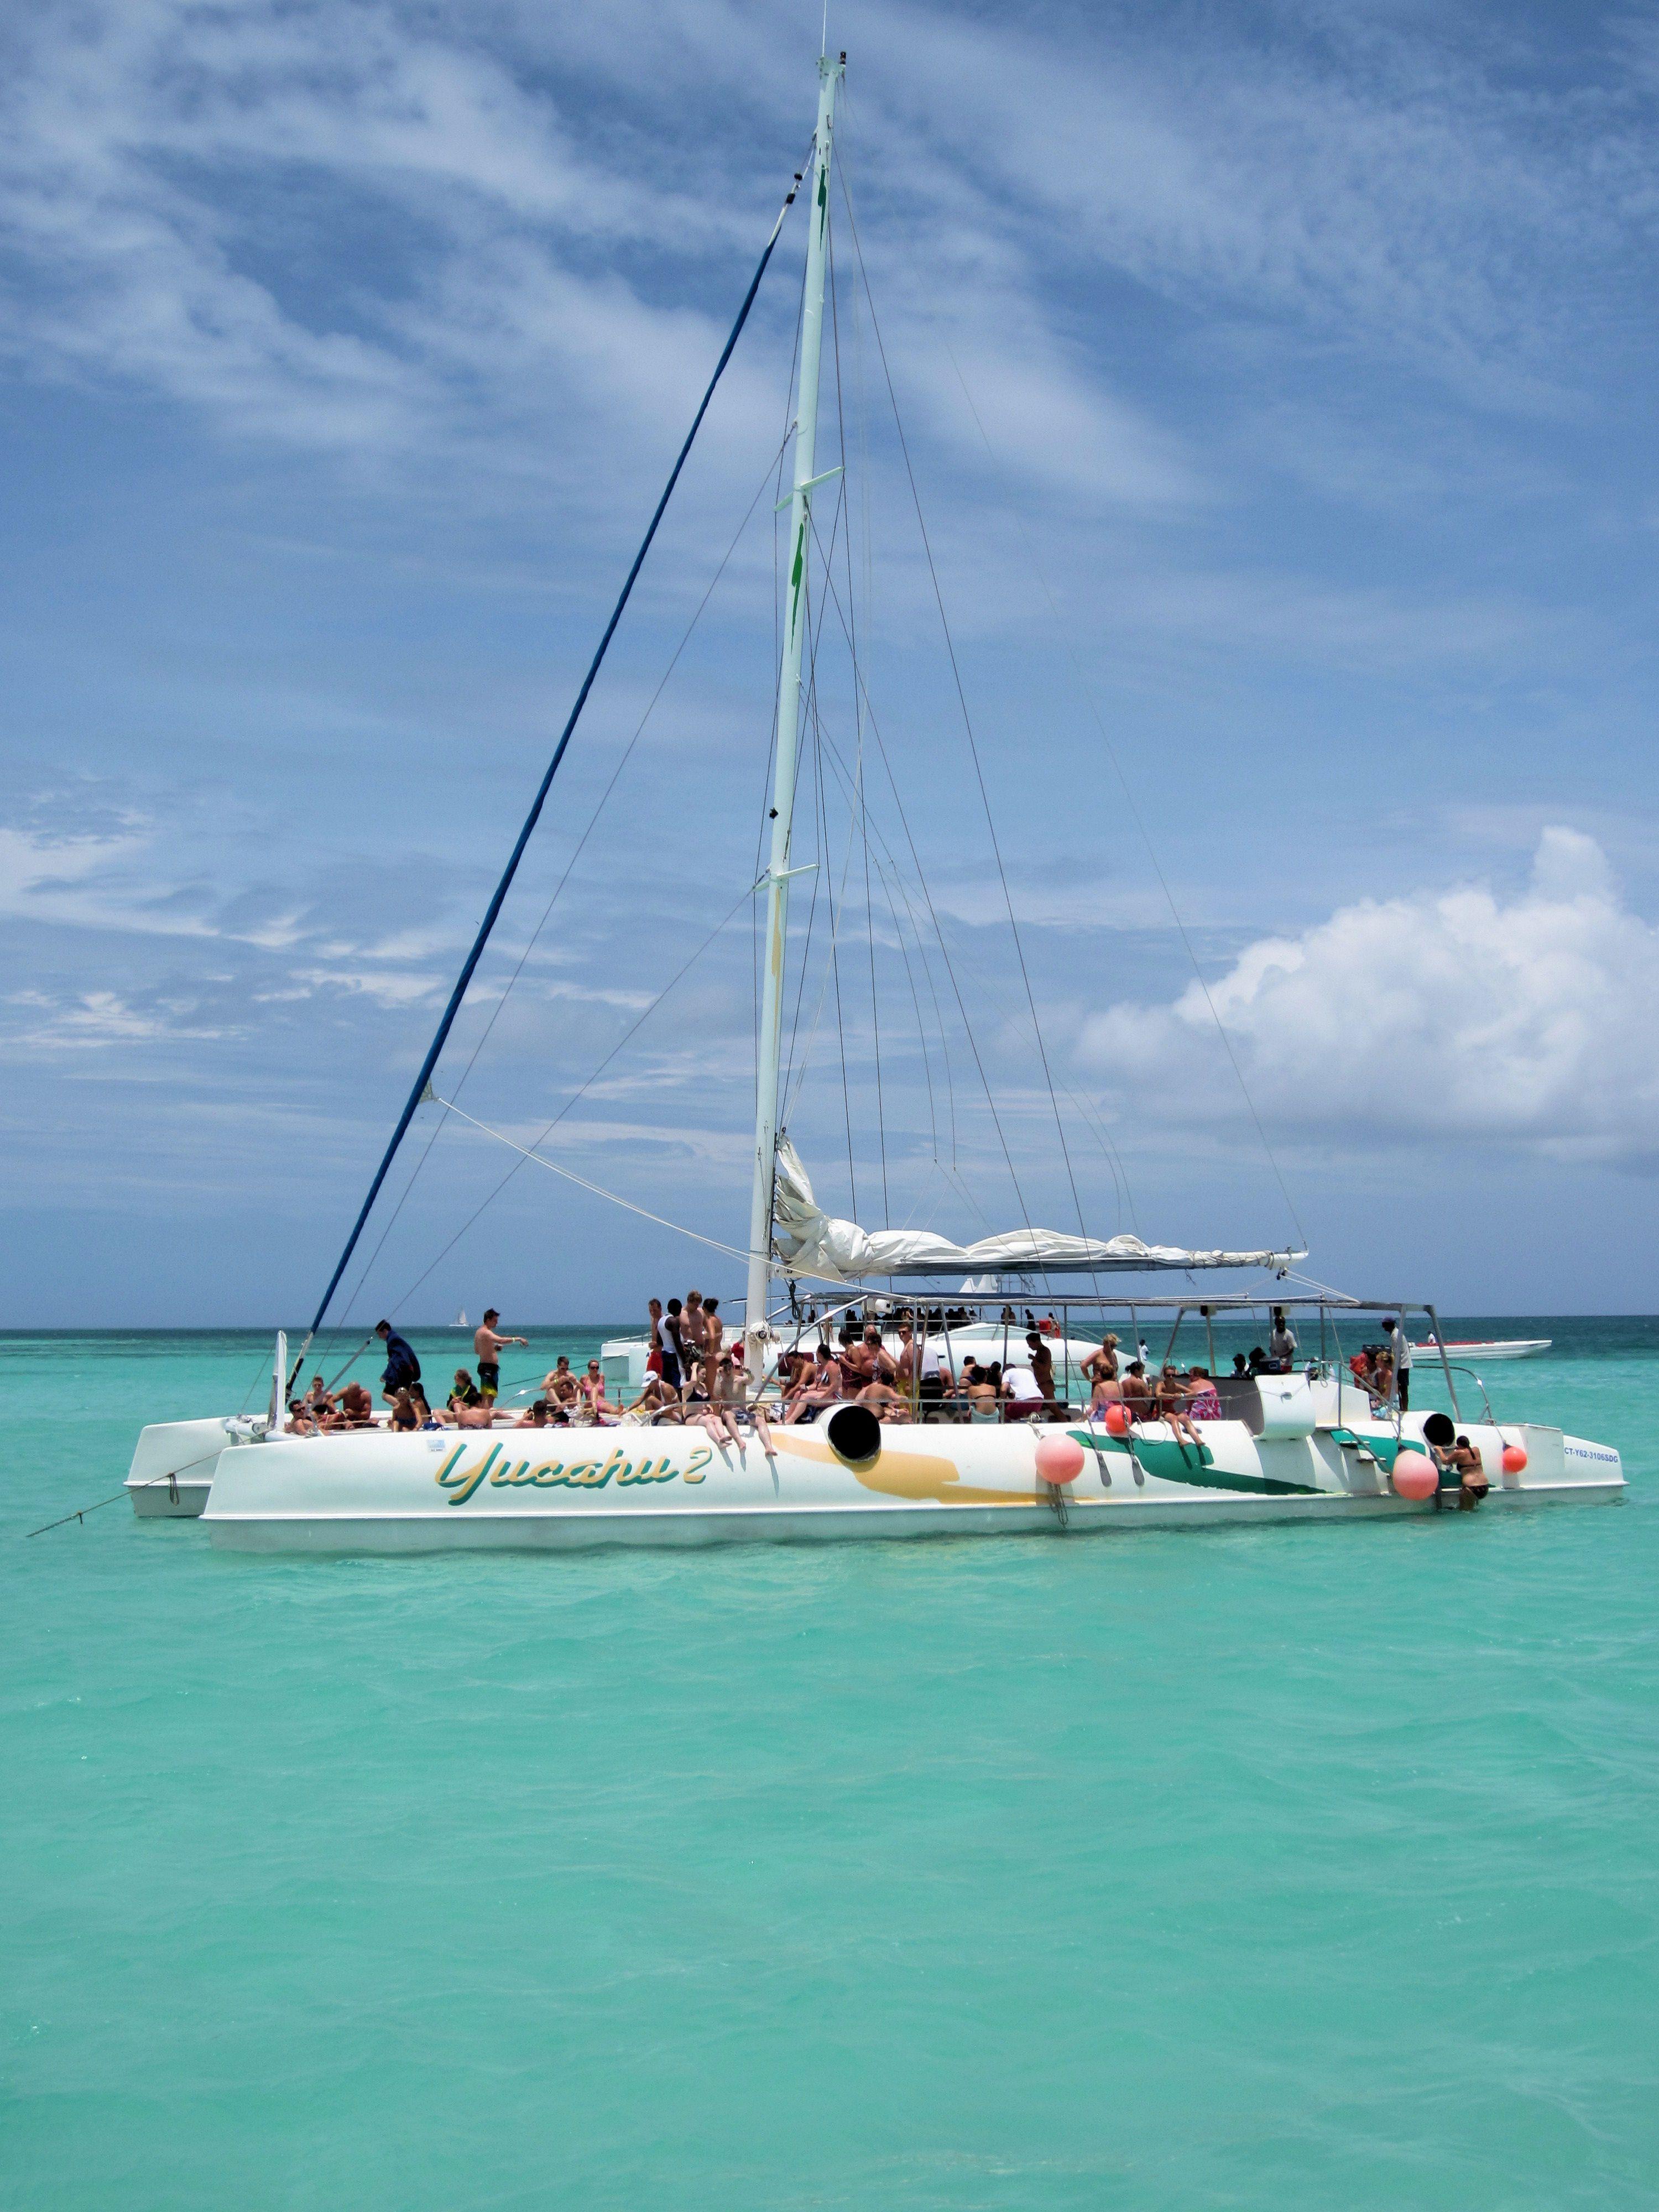 Isla Saona - Catamaran fun in crystal clear water only chest deep ...